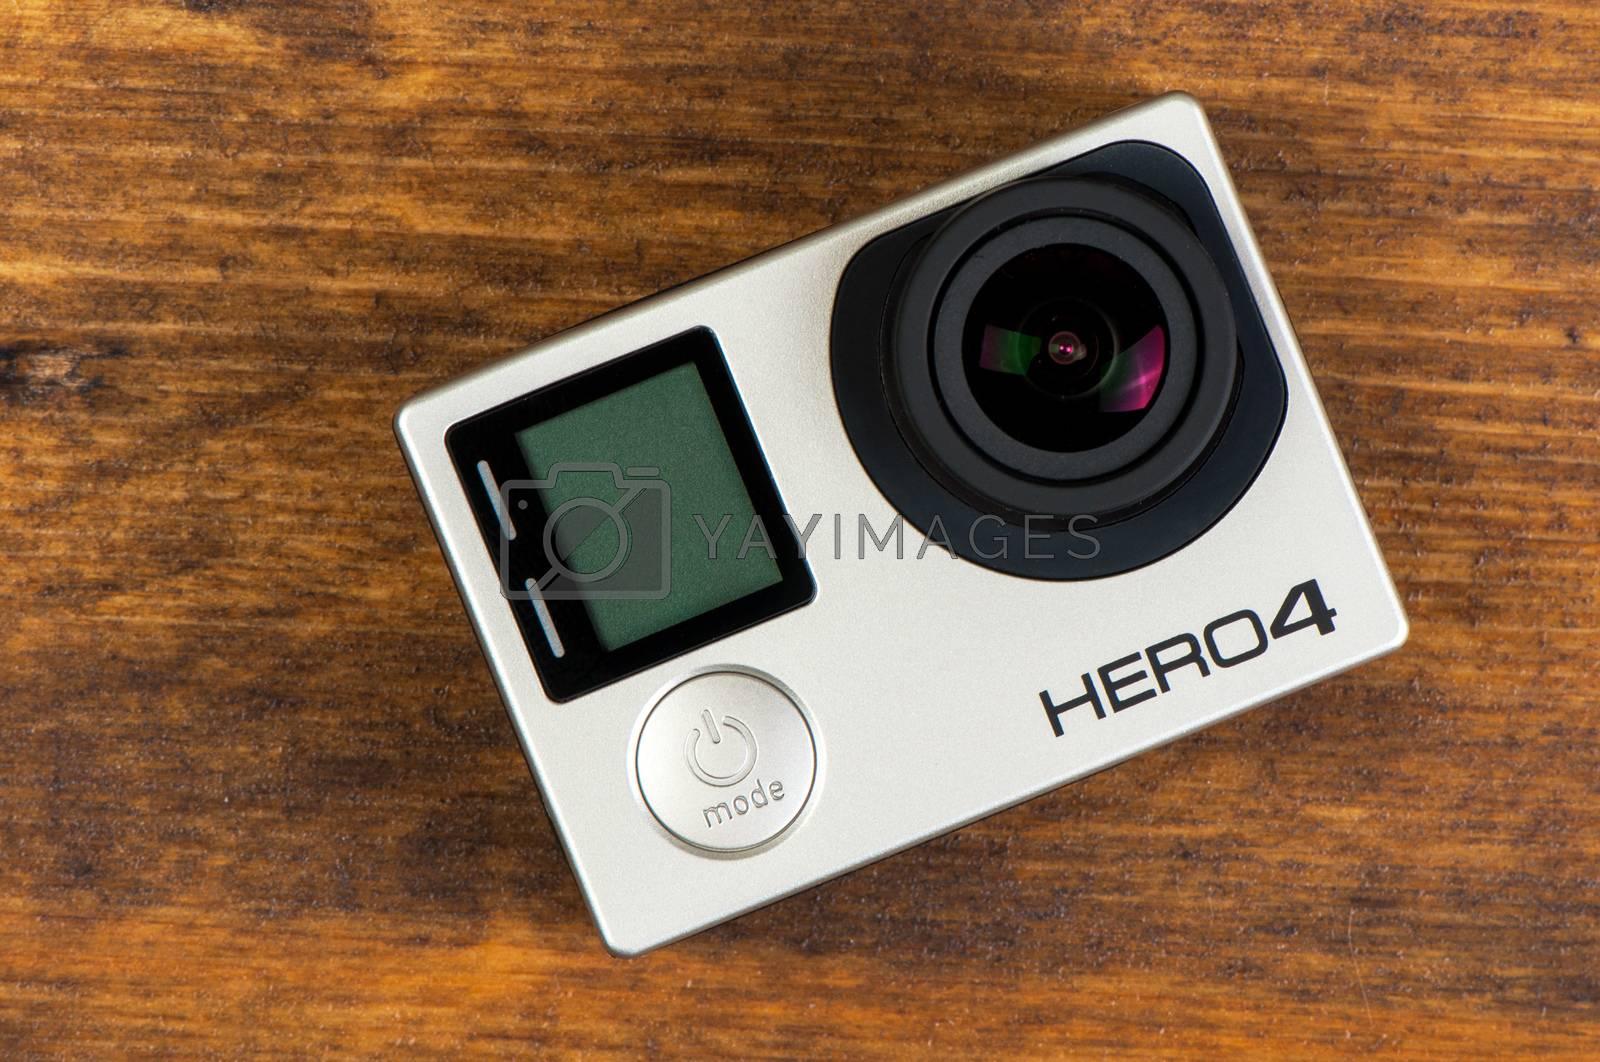 NOVI SAD, SERBIA - JUNE 19, 2016: GoPro Hero 4 Black waterproof action camera announced in september 2014, illustrative editorial